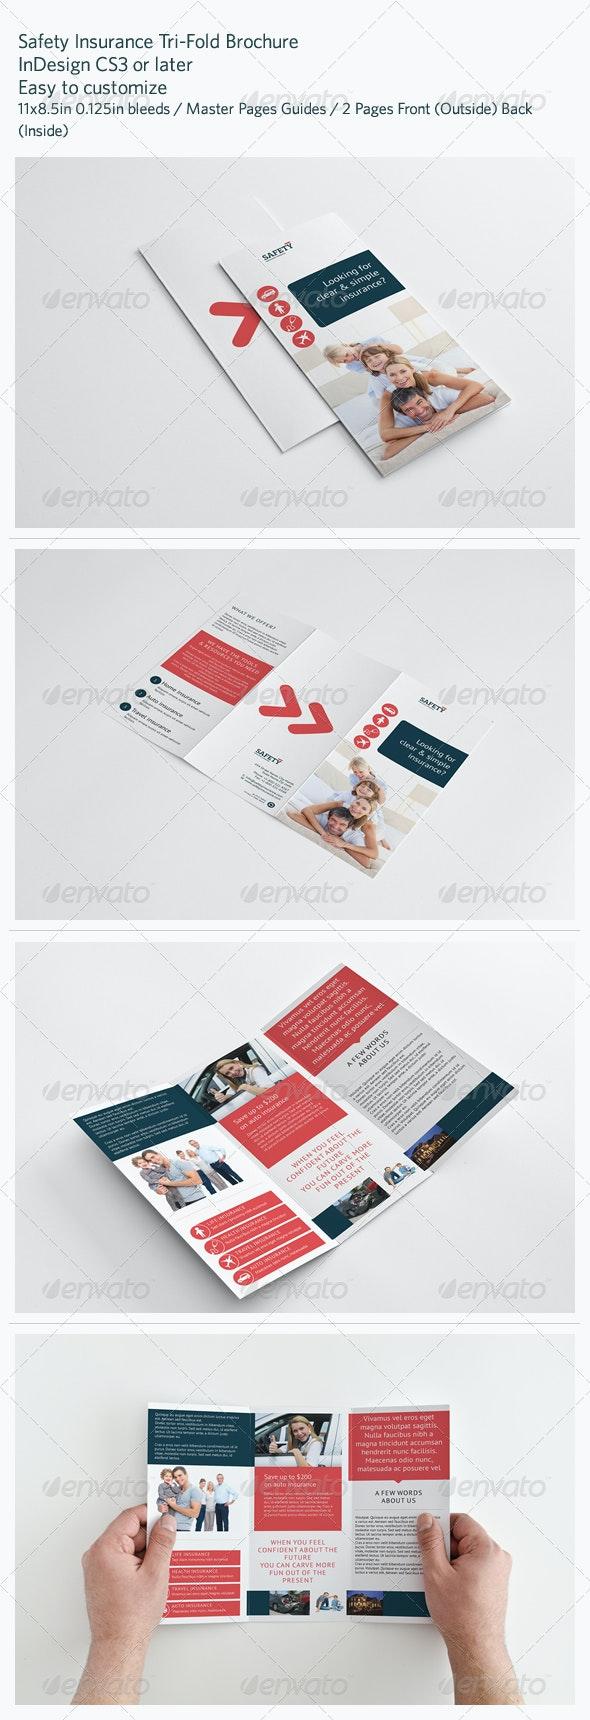 Safety Insurance Tri-Fold Brochure - Brochures Print Templates